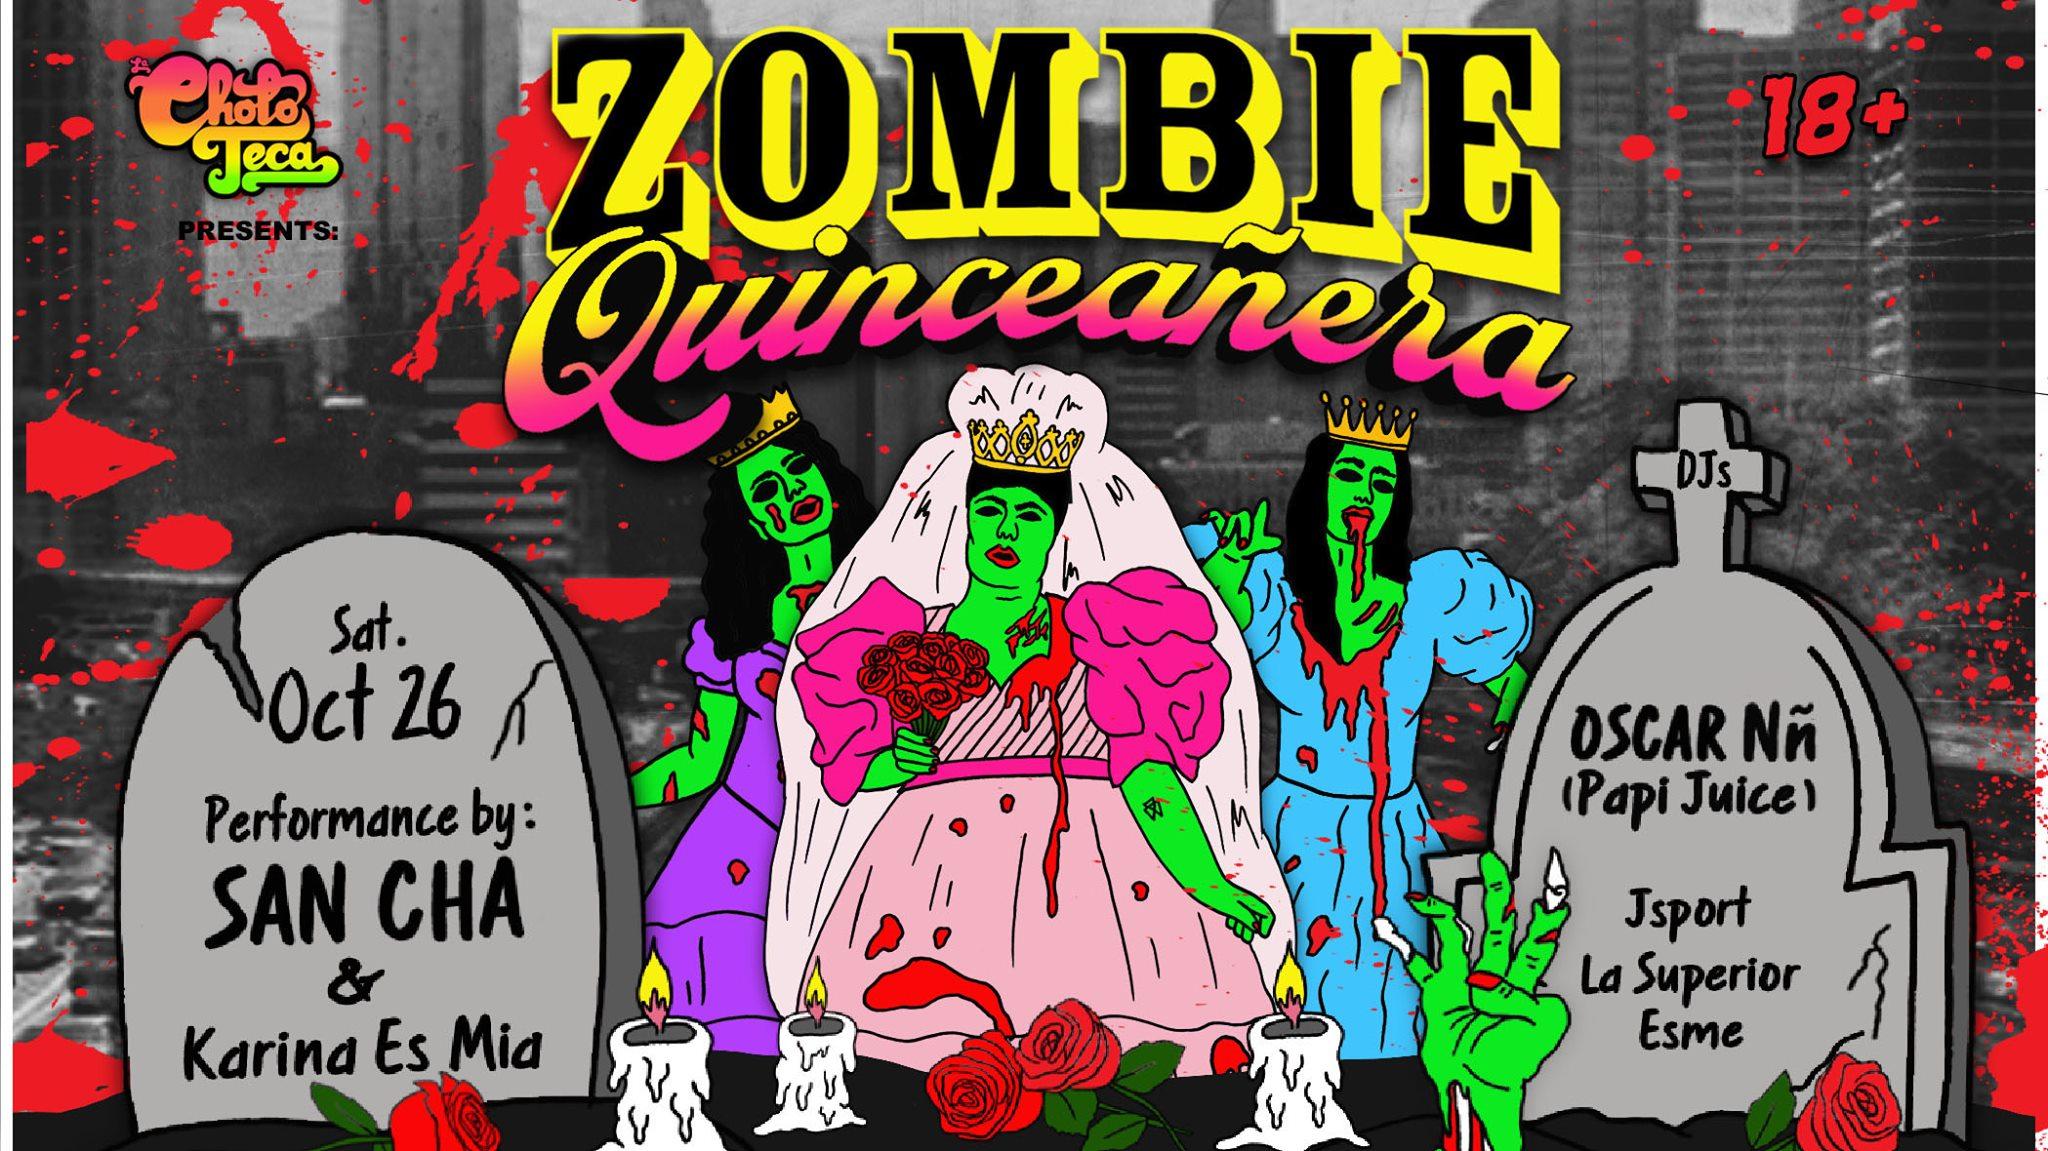 La Choloteca Zombie Quincenera w/ San Cha